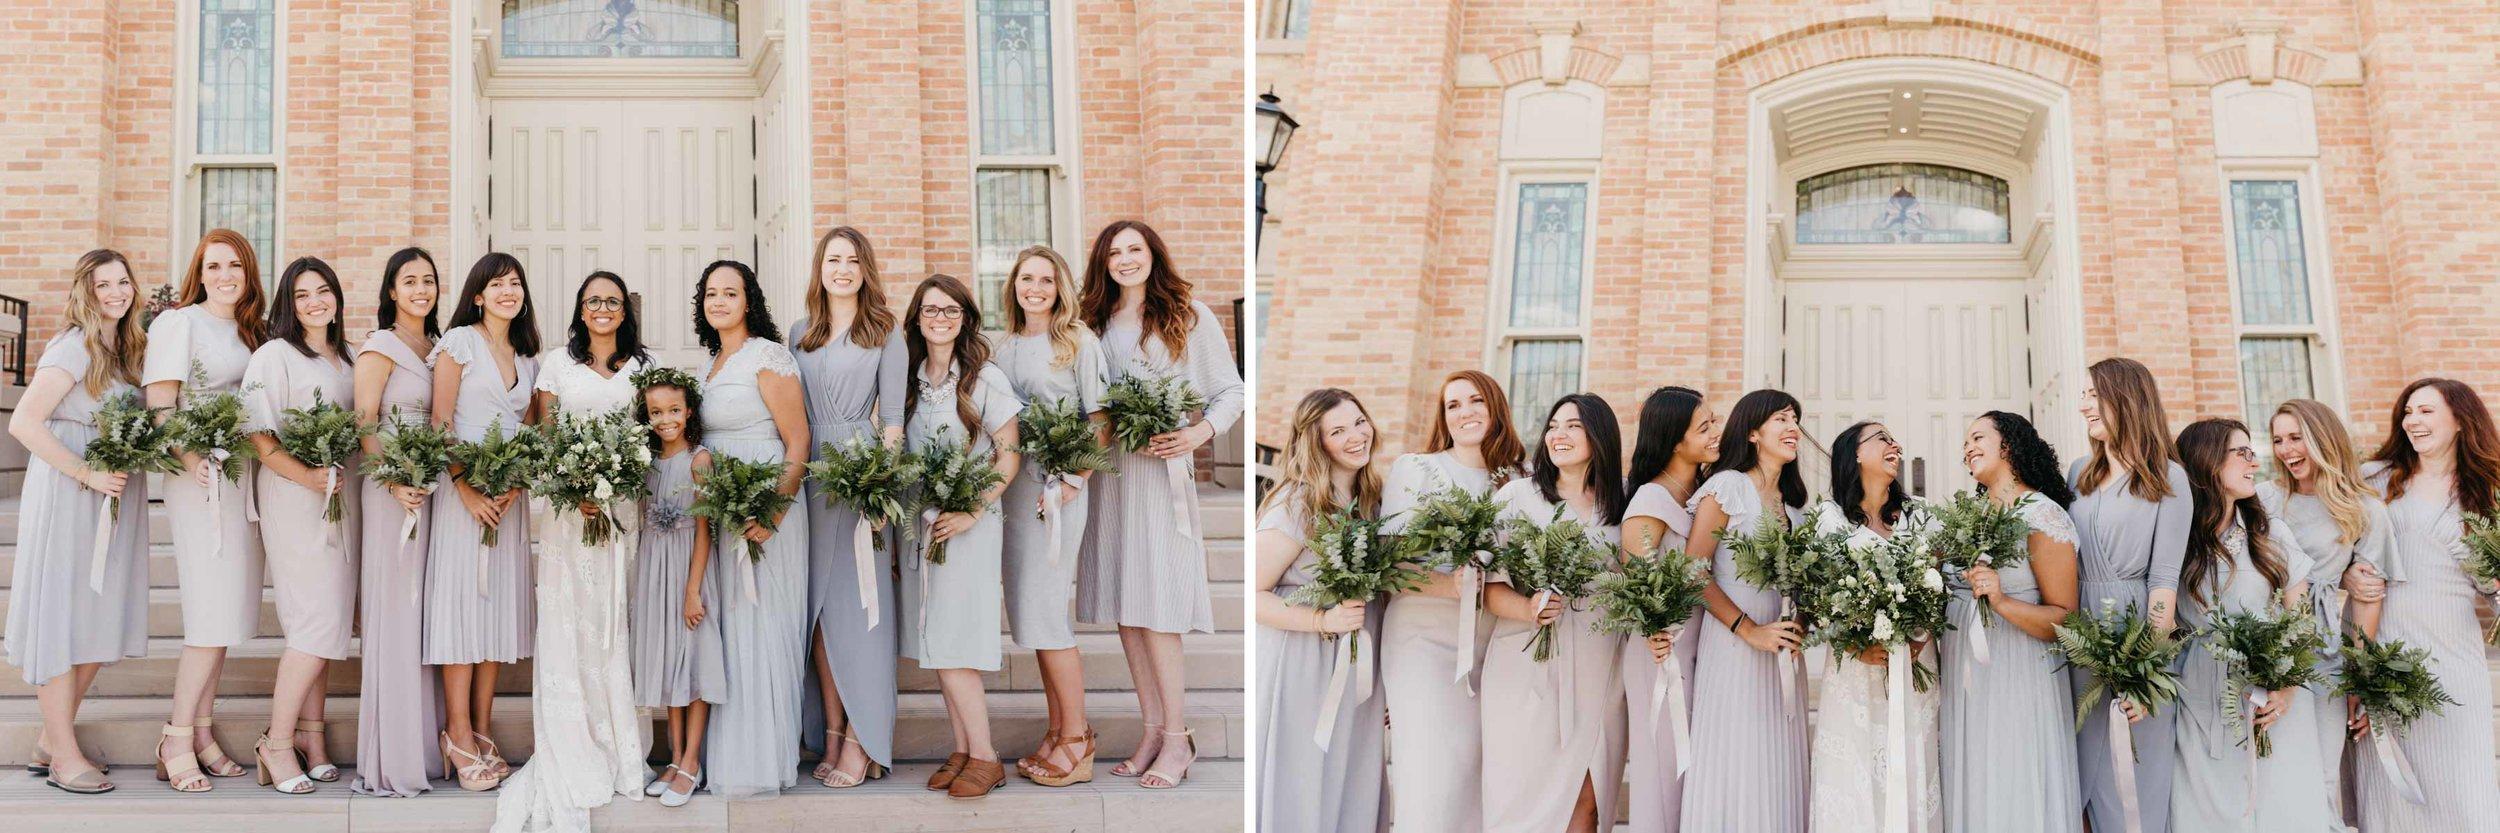 Provo-Wedding-Photographer-13.jpg